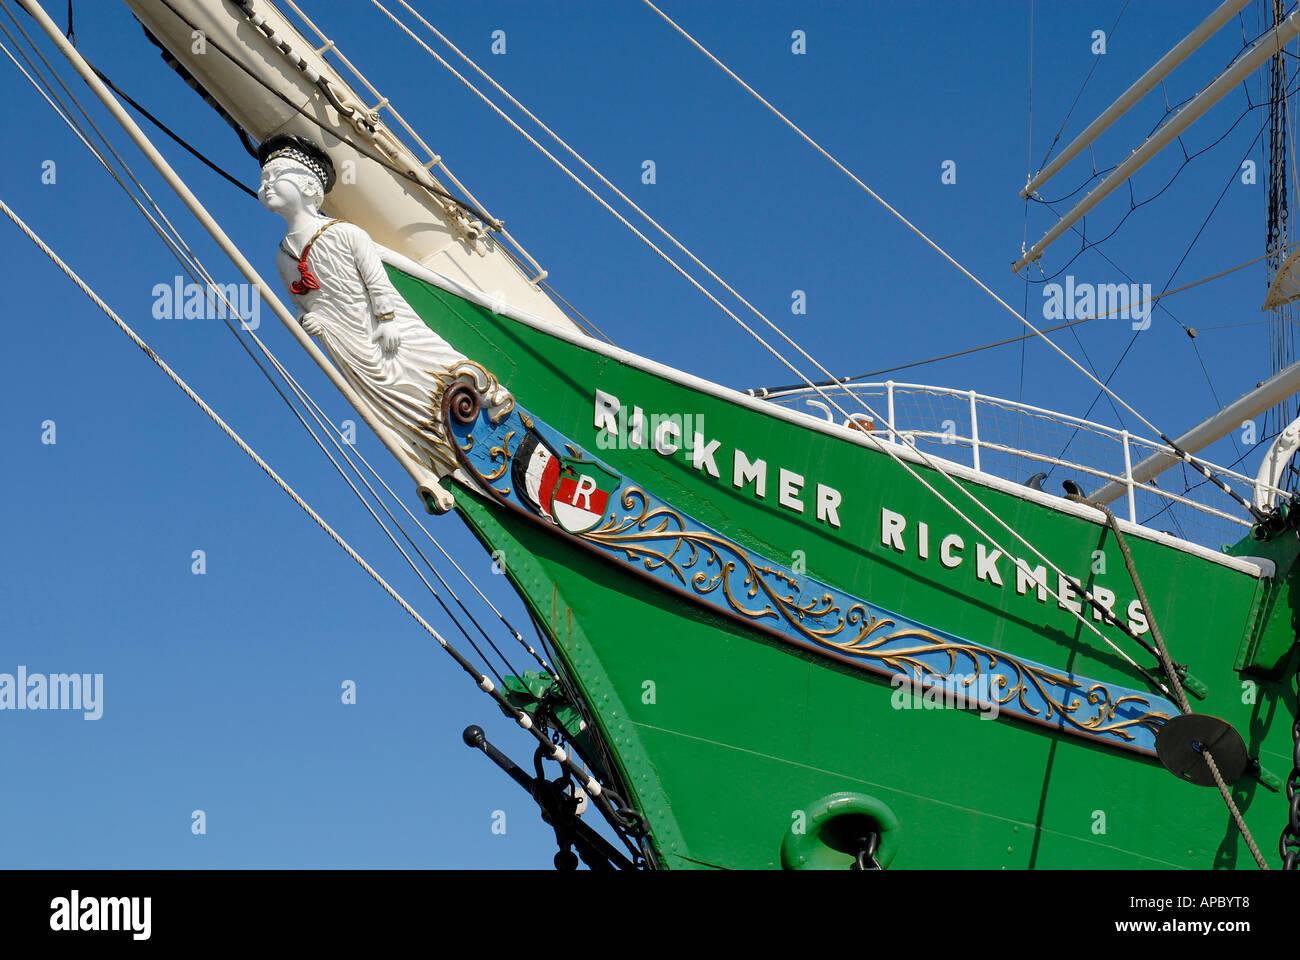 Bow and figurehead of historic sail ship Rickmer Rickmers at Hamburg Harbour, Hamburg, Germany - Stock Image